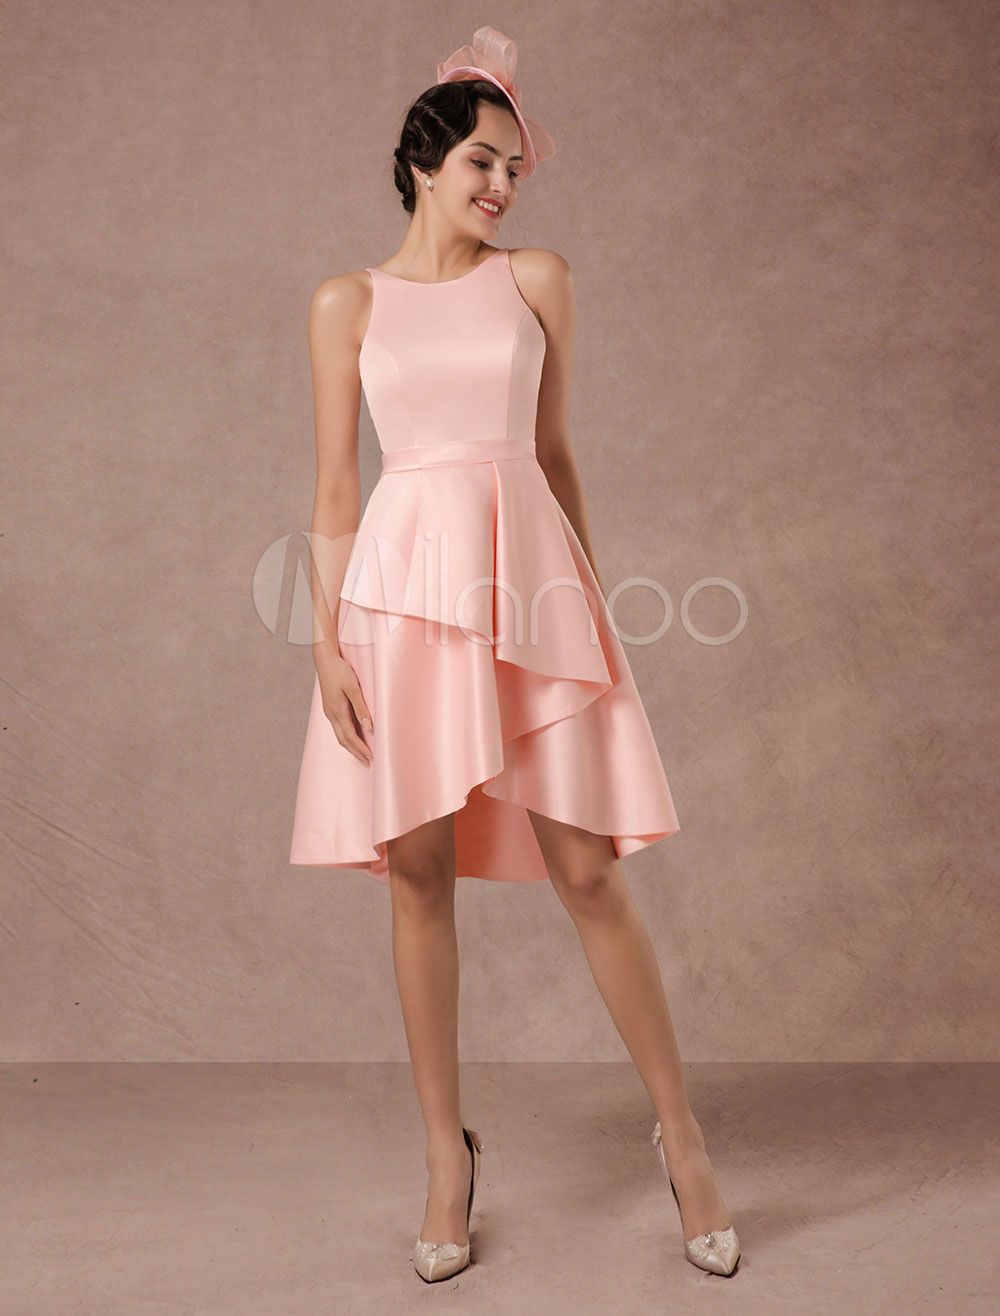 Short Wedding Dress Pink Satin Vintage Summer Wedding Dresses 2018 A-line Asymmetrical Train Cocktail Dress (Pink Wedding Dress) photo